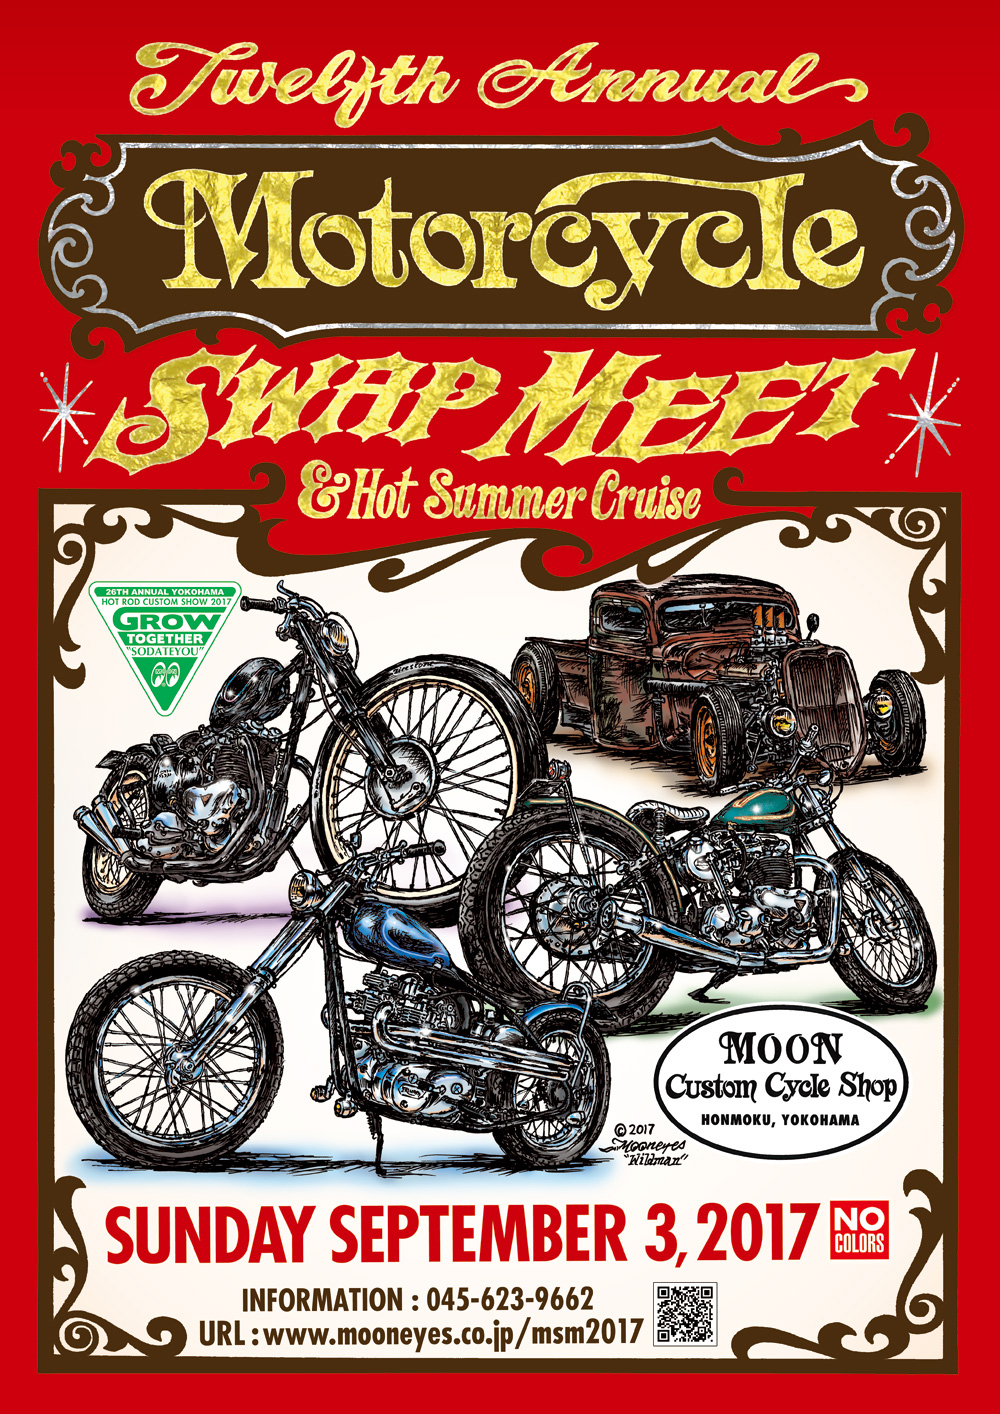 12th Motorcycle Swap Meet 2017 エントリー開始!!